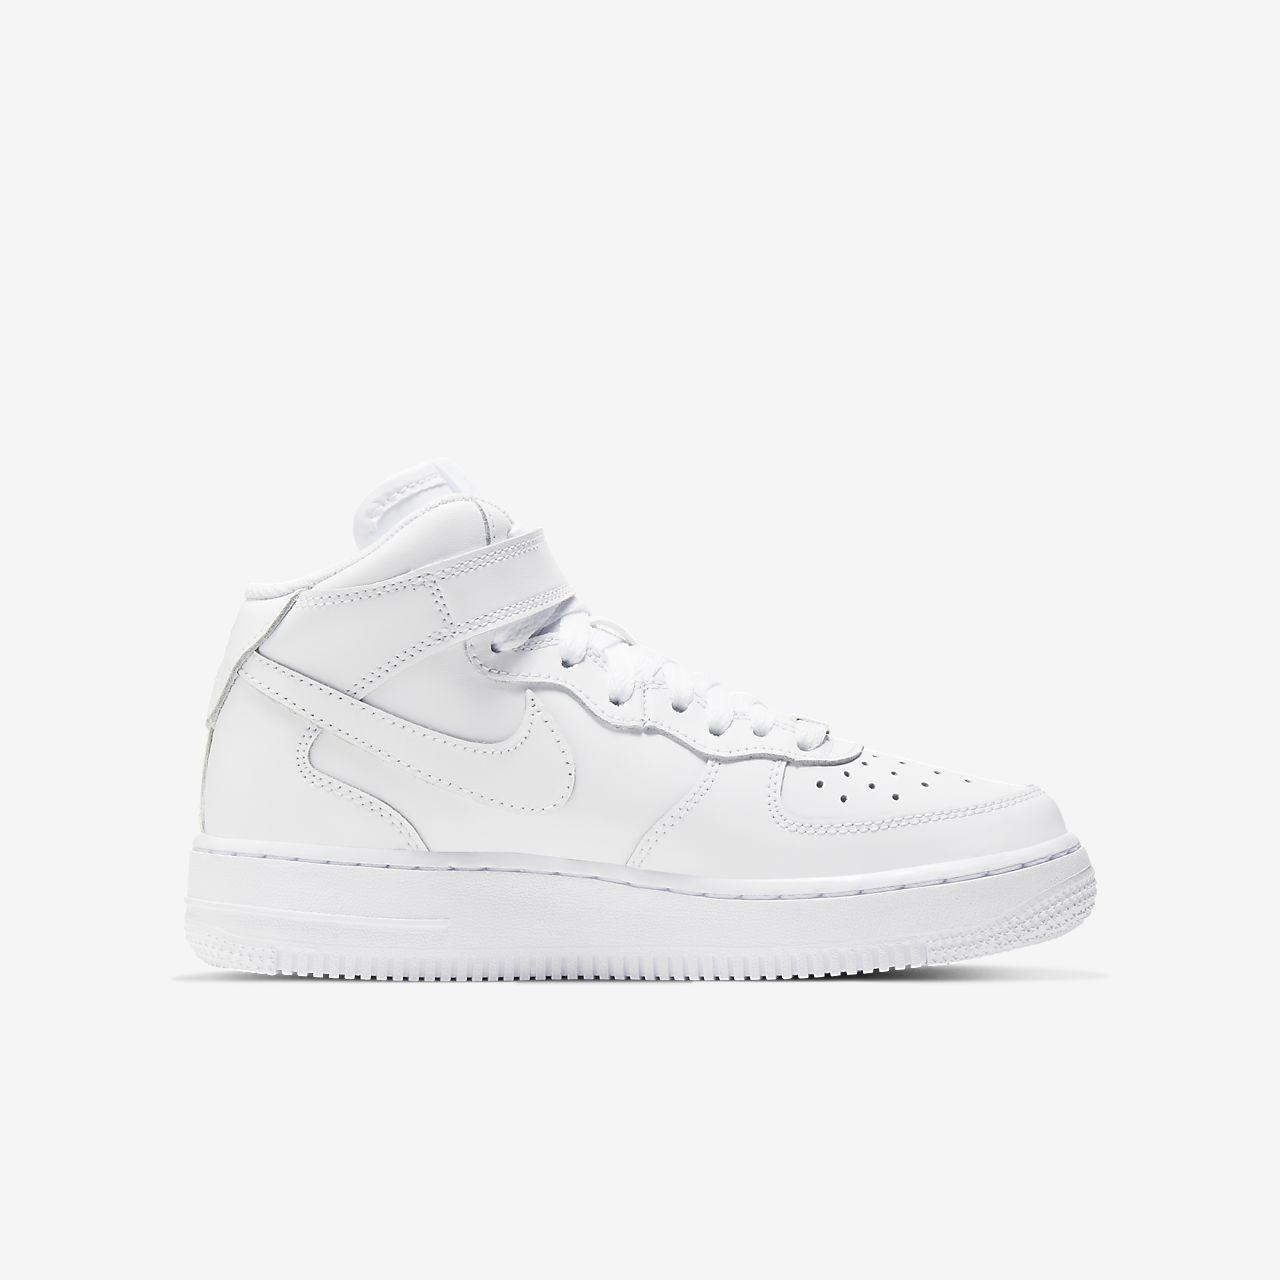 08b3ebc6dde8 Nike Air Force 1 Mid 06 Big Kids  Shoe. Nike.com